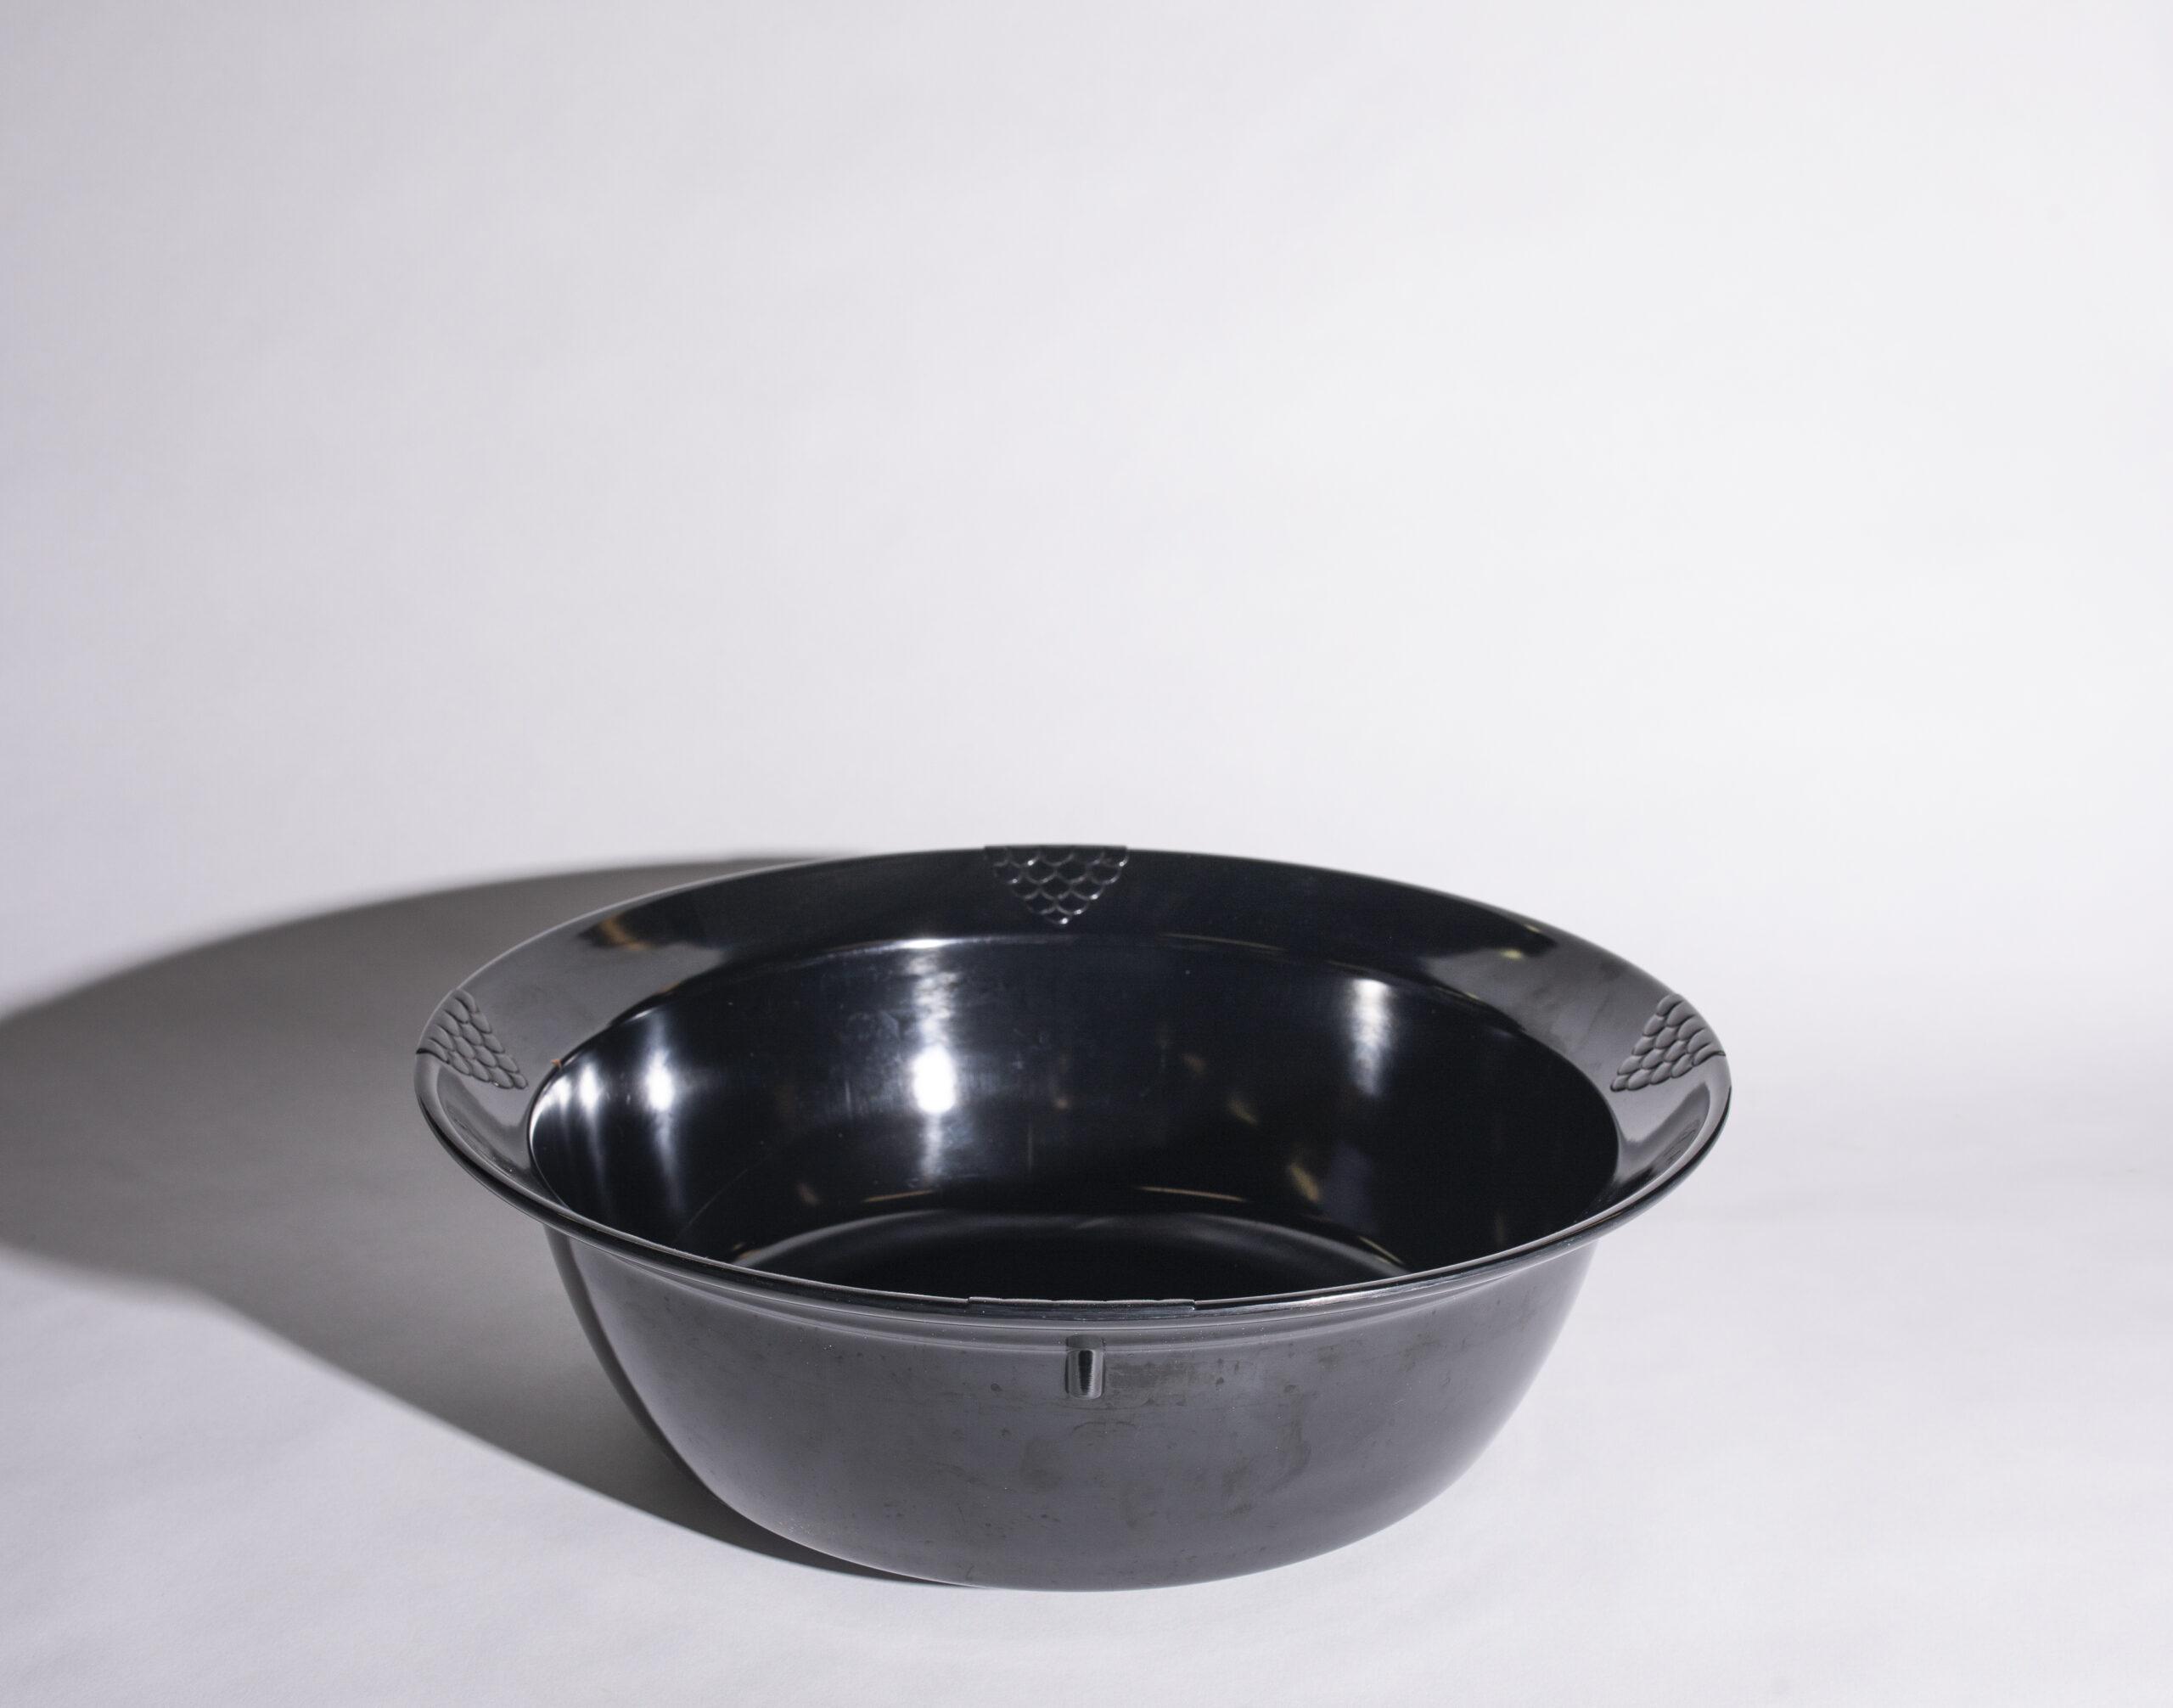 Salad bowl (18'', round, black, plastic)